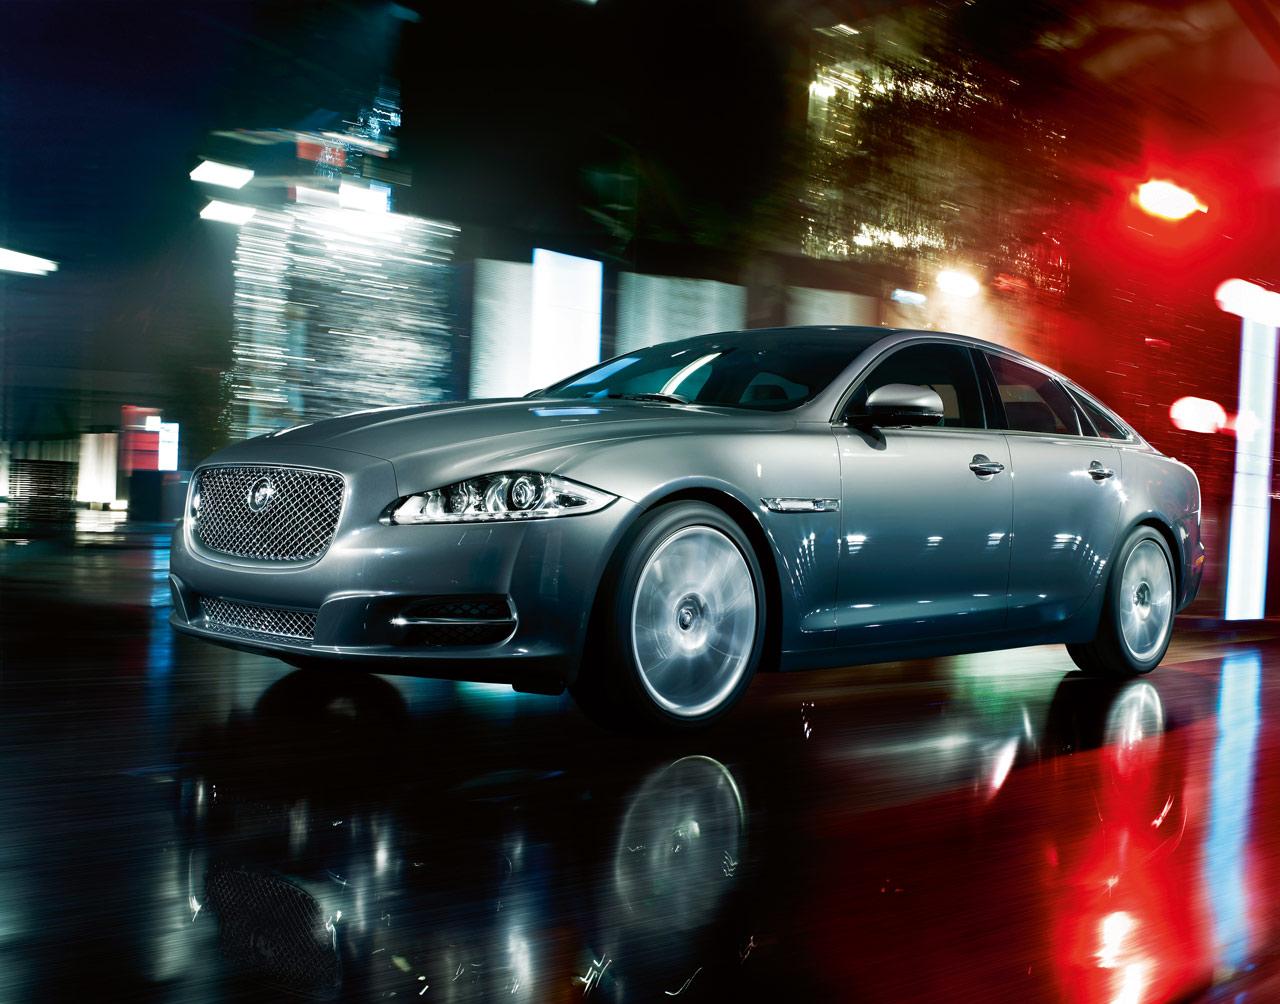 Auto Wallpapers Jaguar xj